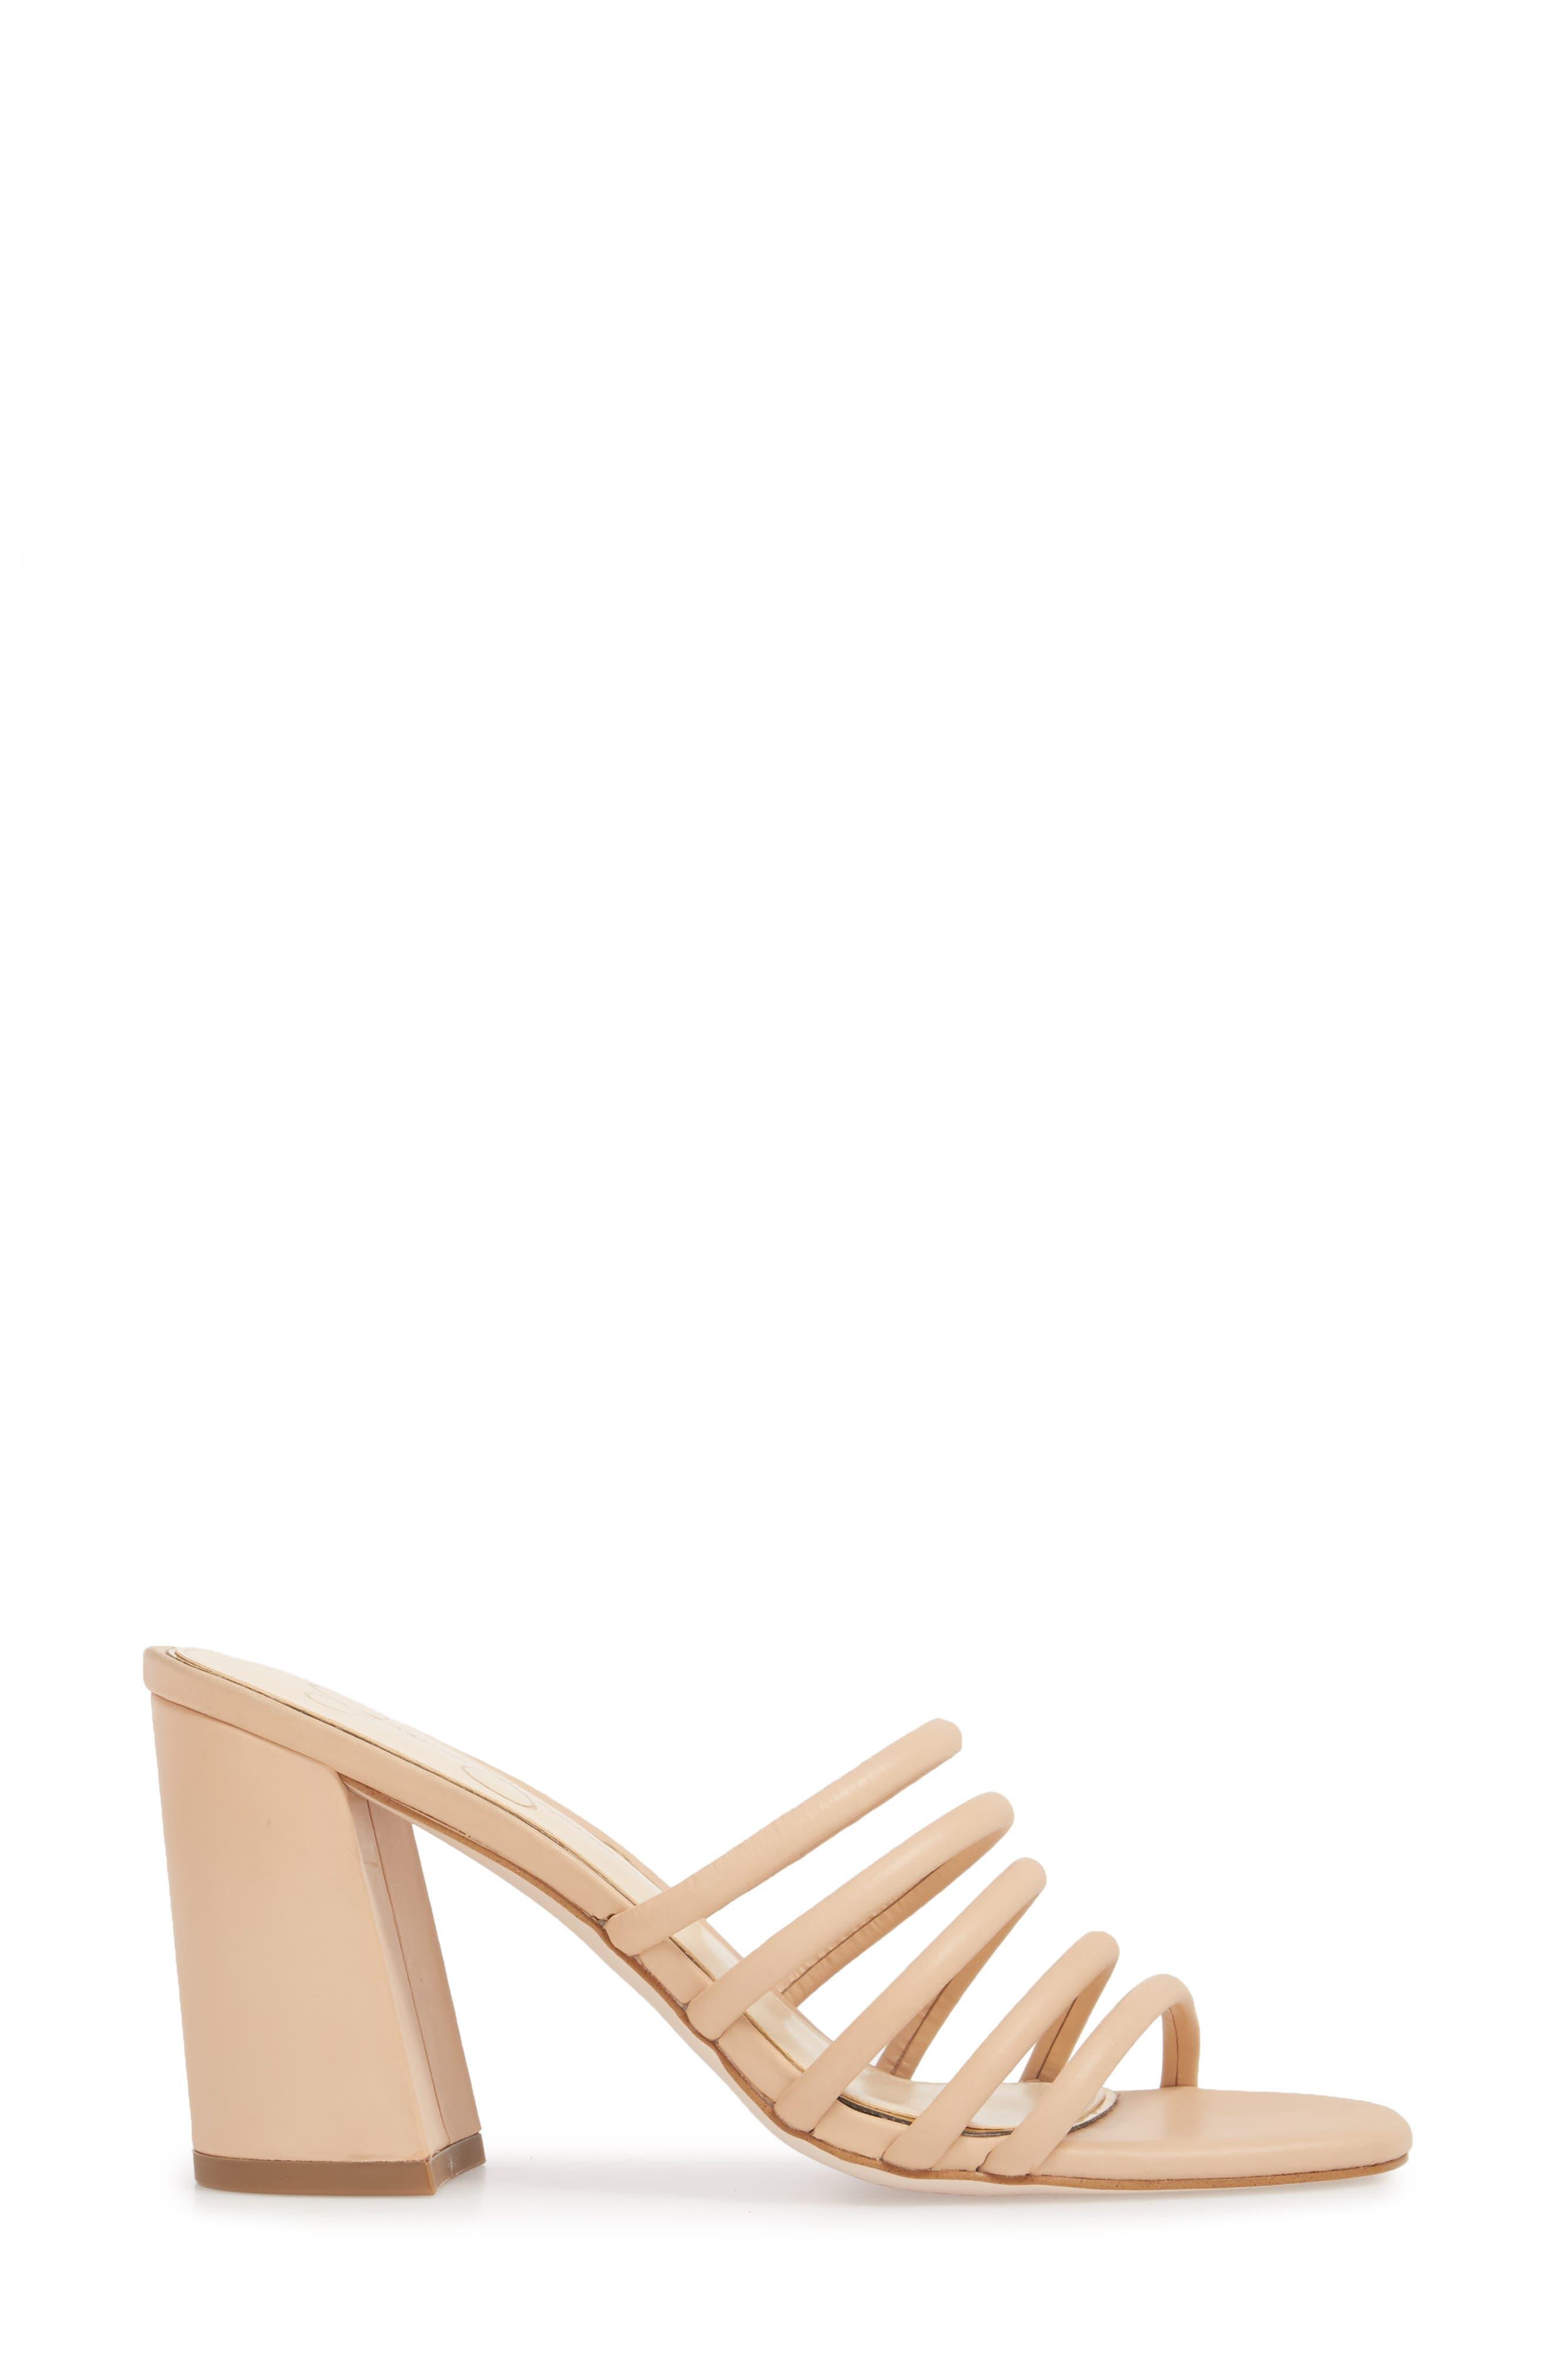 Fixton Strappy Slide Sandal,                             Alternate thumbnail 3, color,                             260